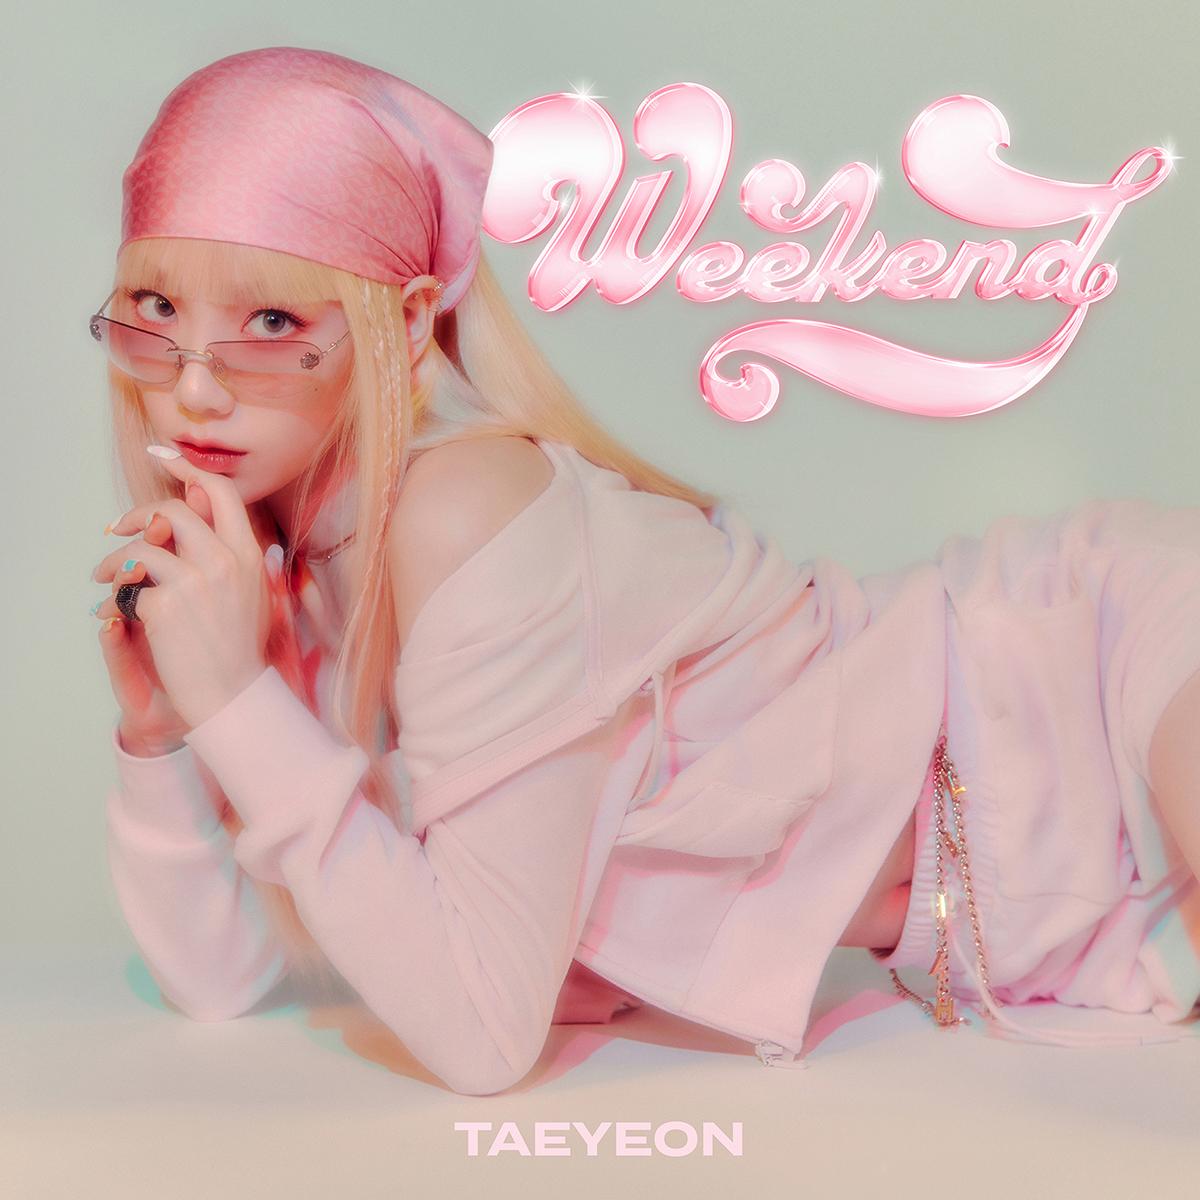 "On Hellokpop Playlist: Taeyeon Blows The Rainy Season Away With New Digital Single ""Weekend"""